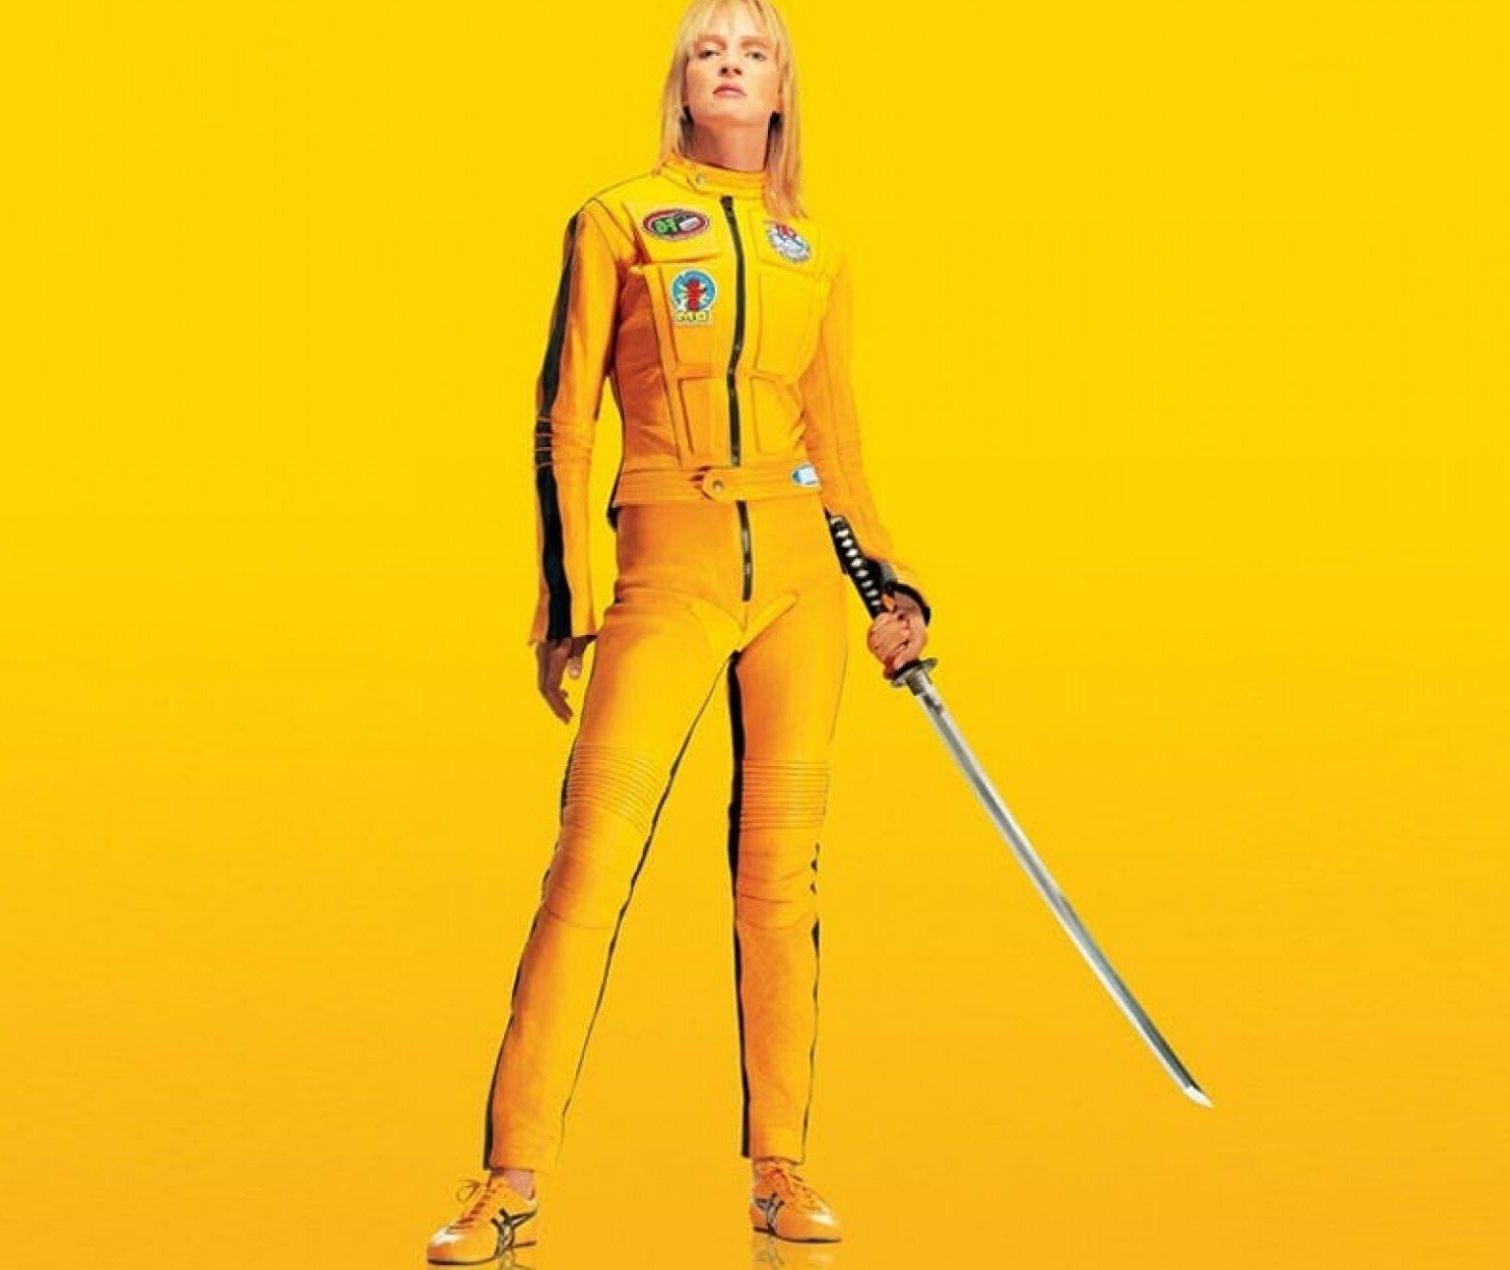 kill bill 2 e1626080476245 10 Brutal Facts About Quentin Tarantino's Kill Bill